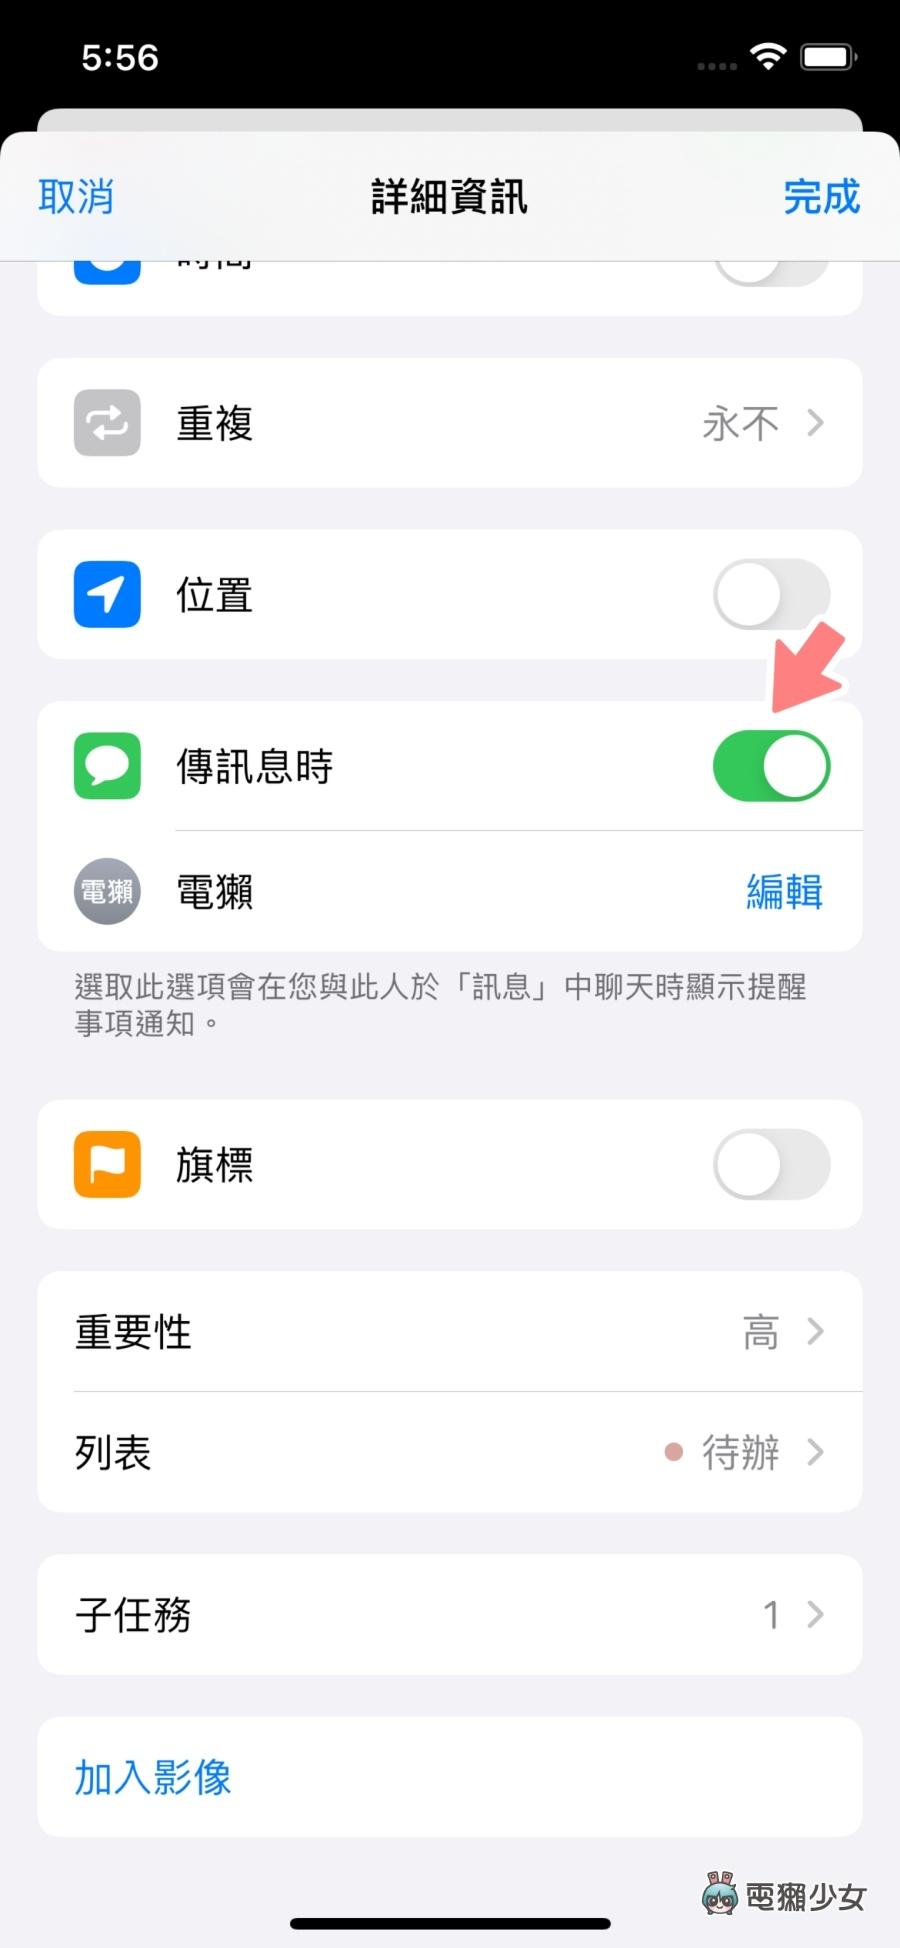 iPhone 提醒事項有這些功能?快速掃描文件、拍攝照片、還可以在傳訊息時設定提醒通知!